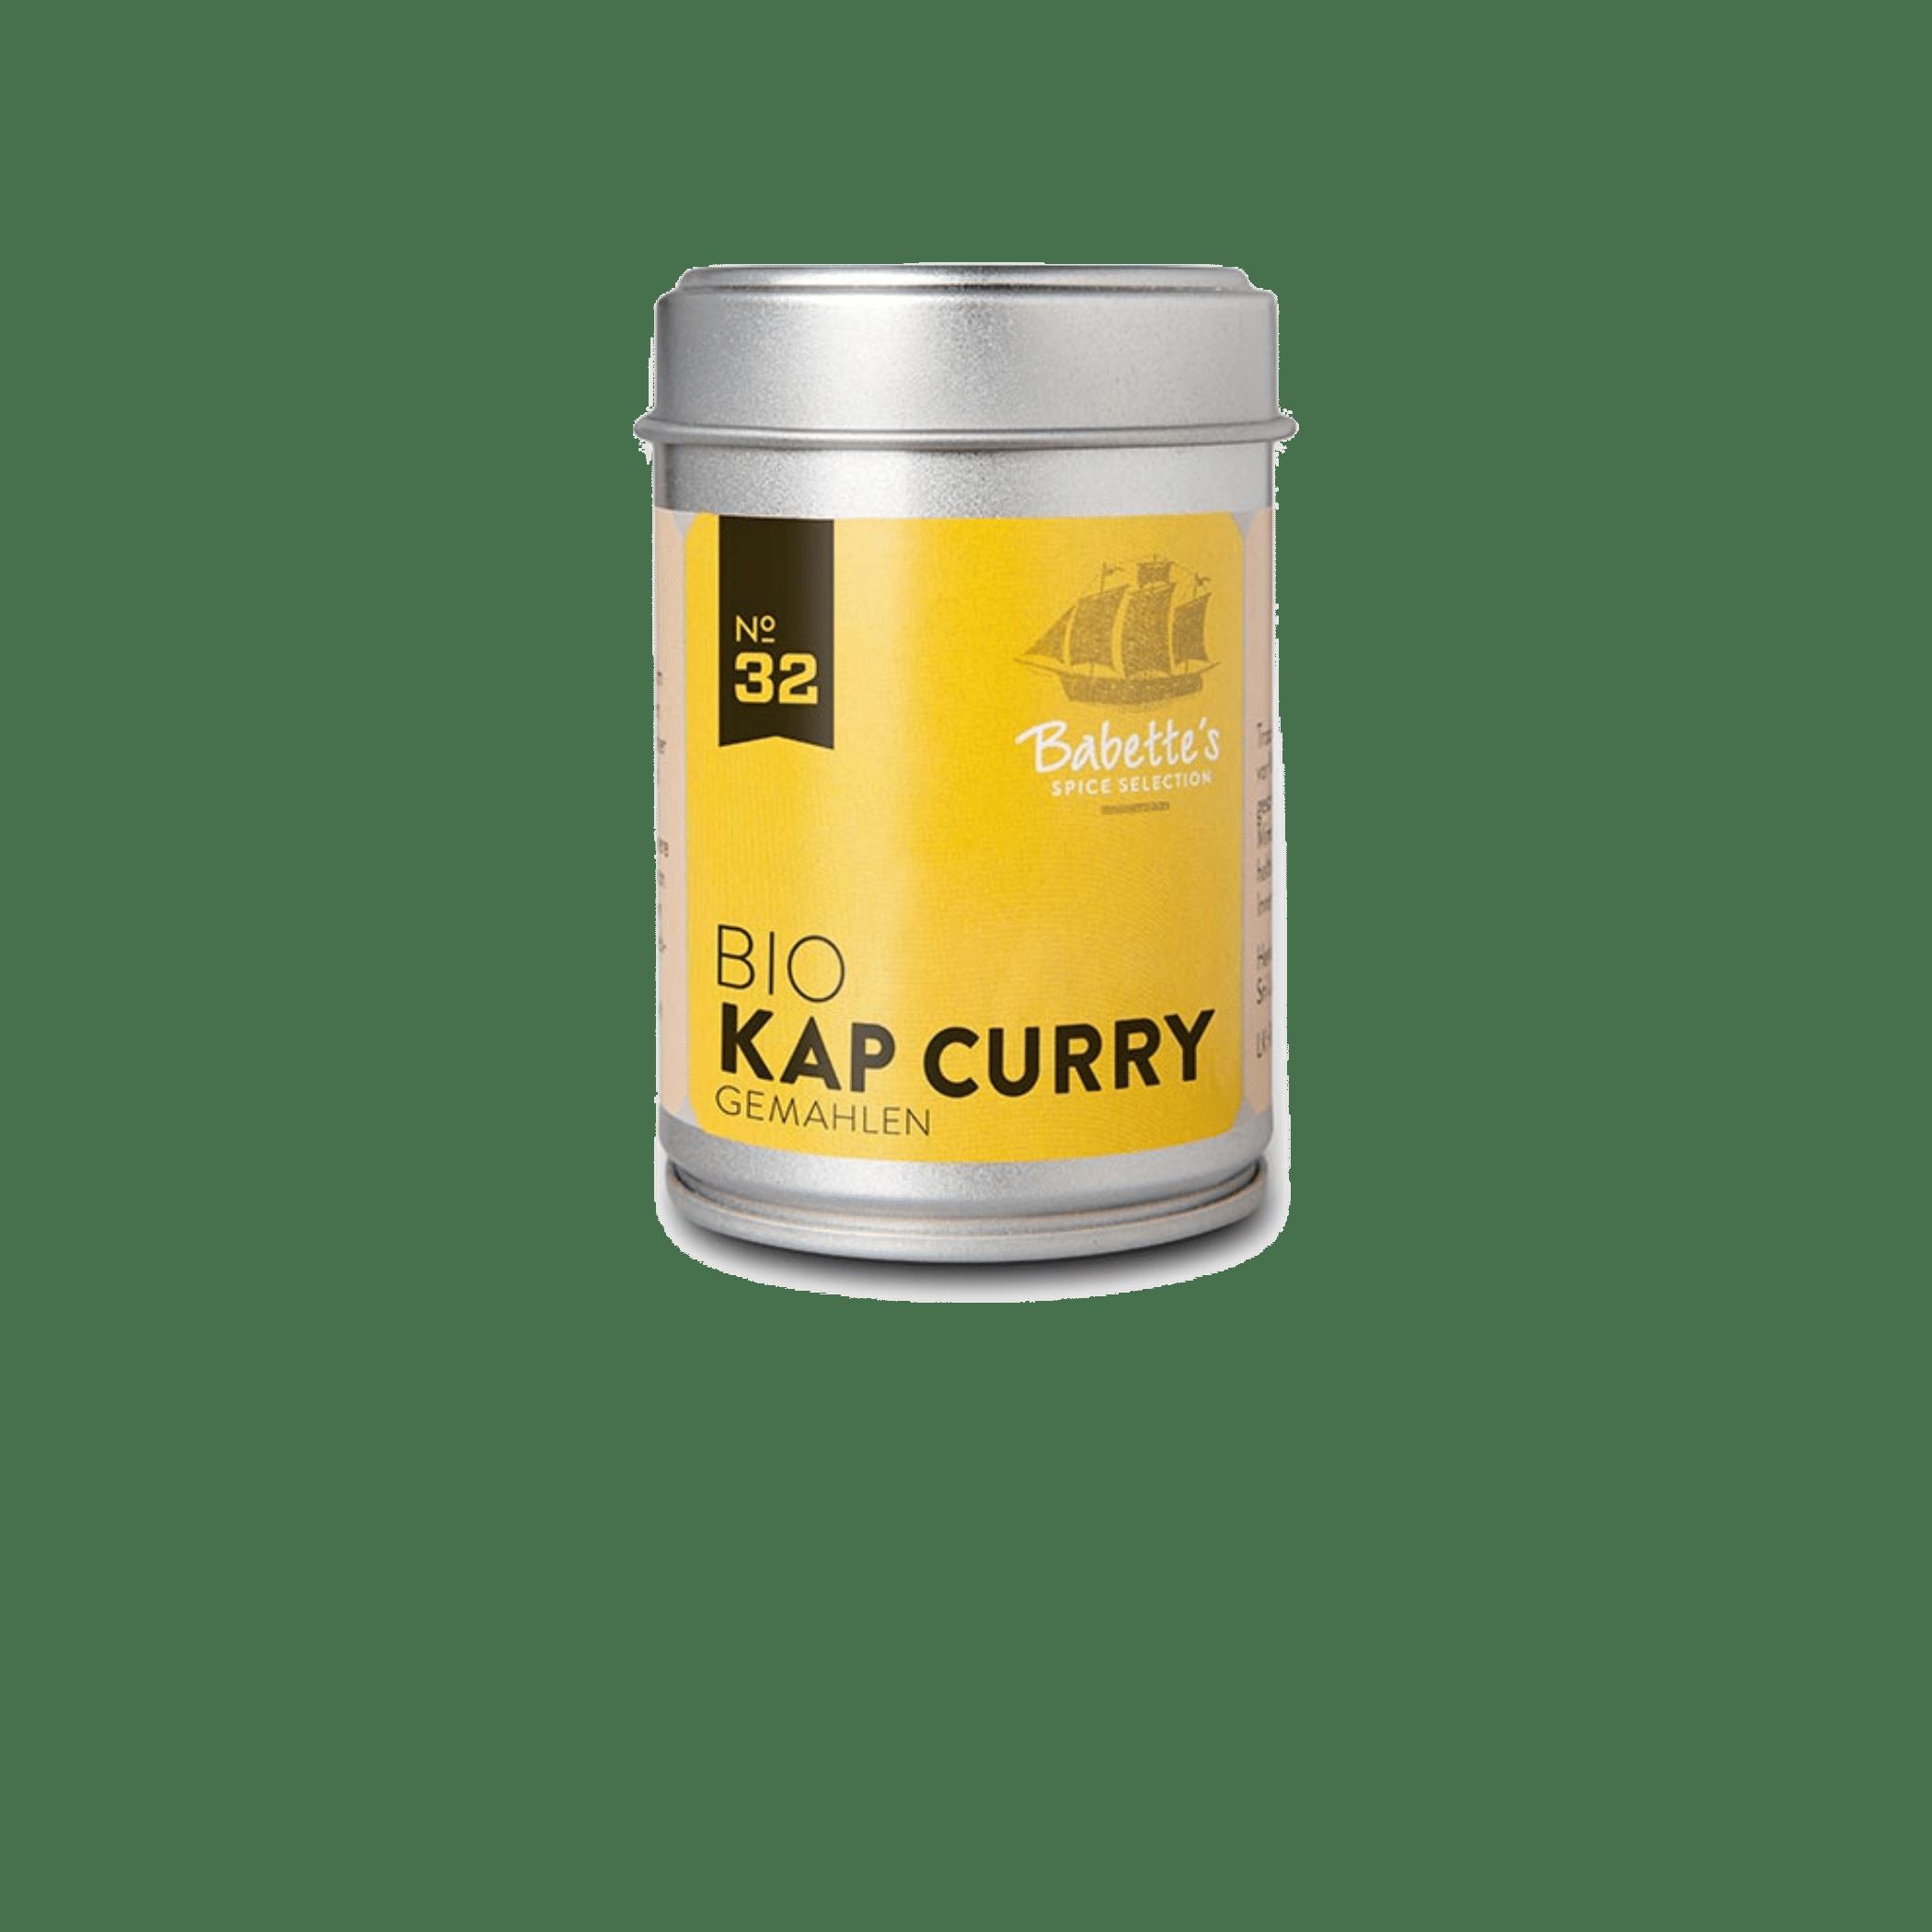 Bio Kap Curry Gewürz Feinkost